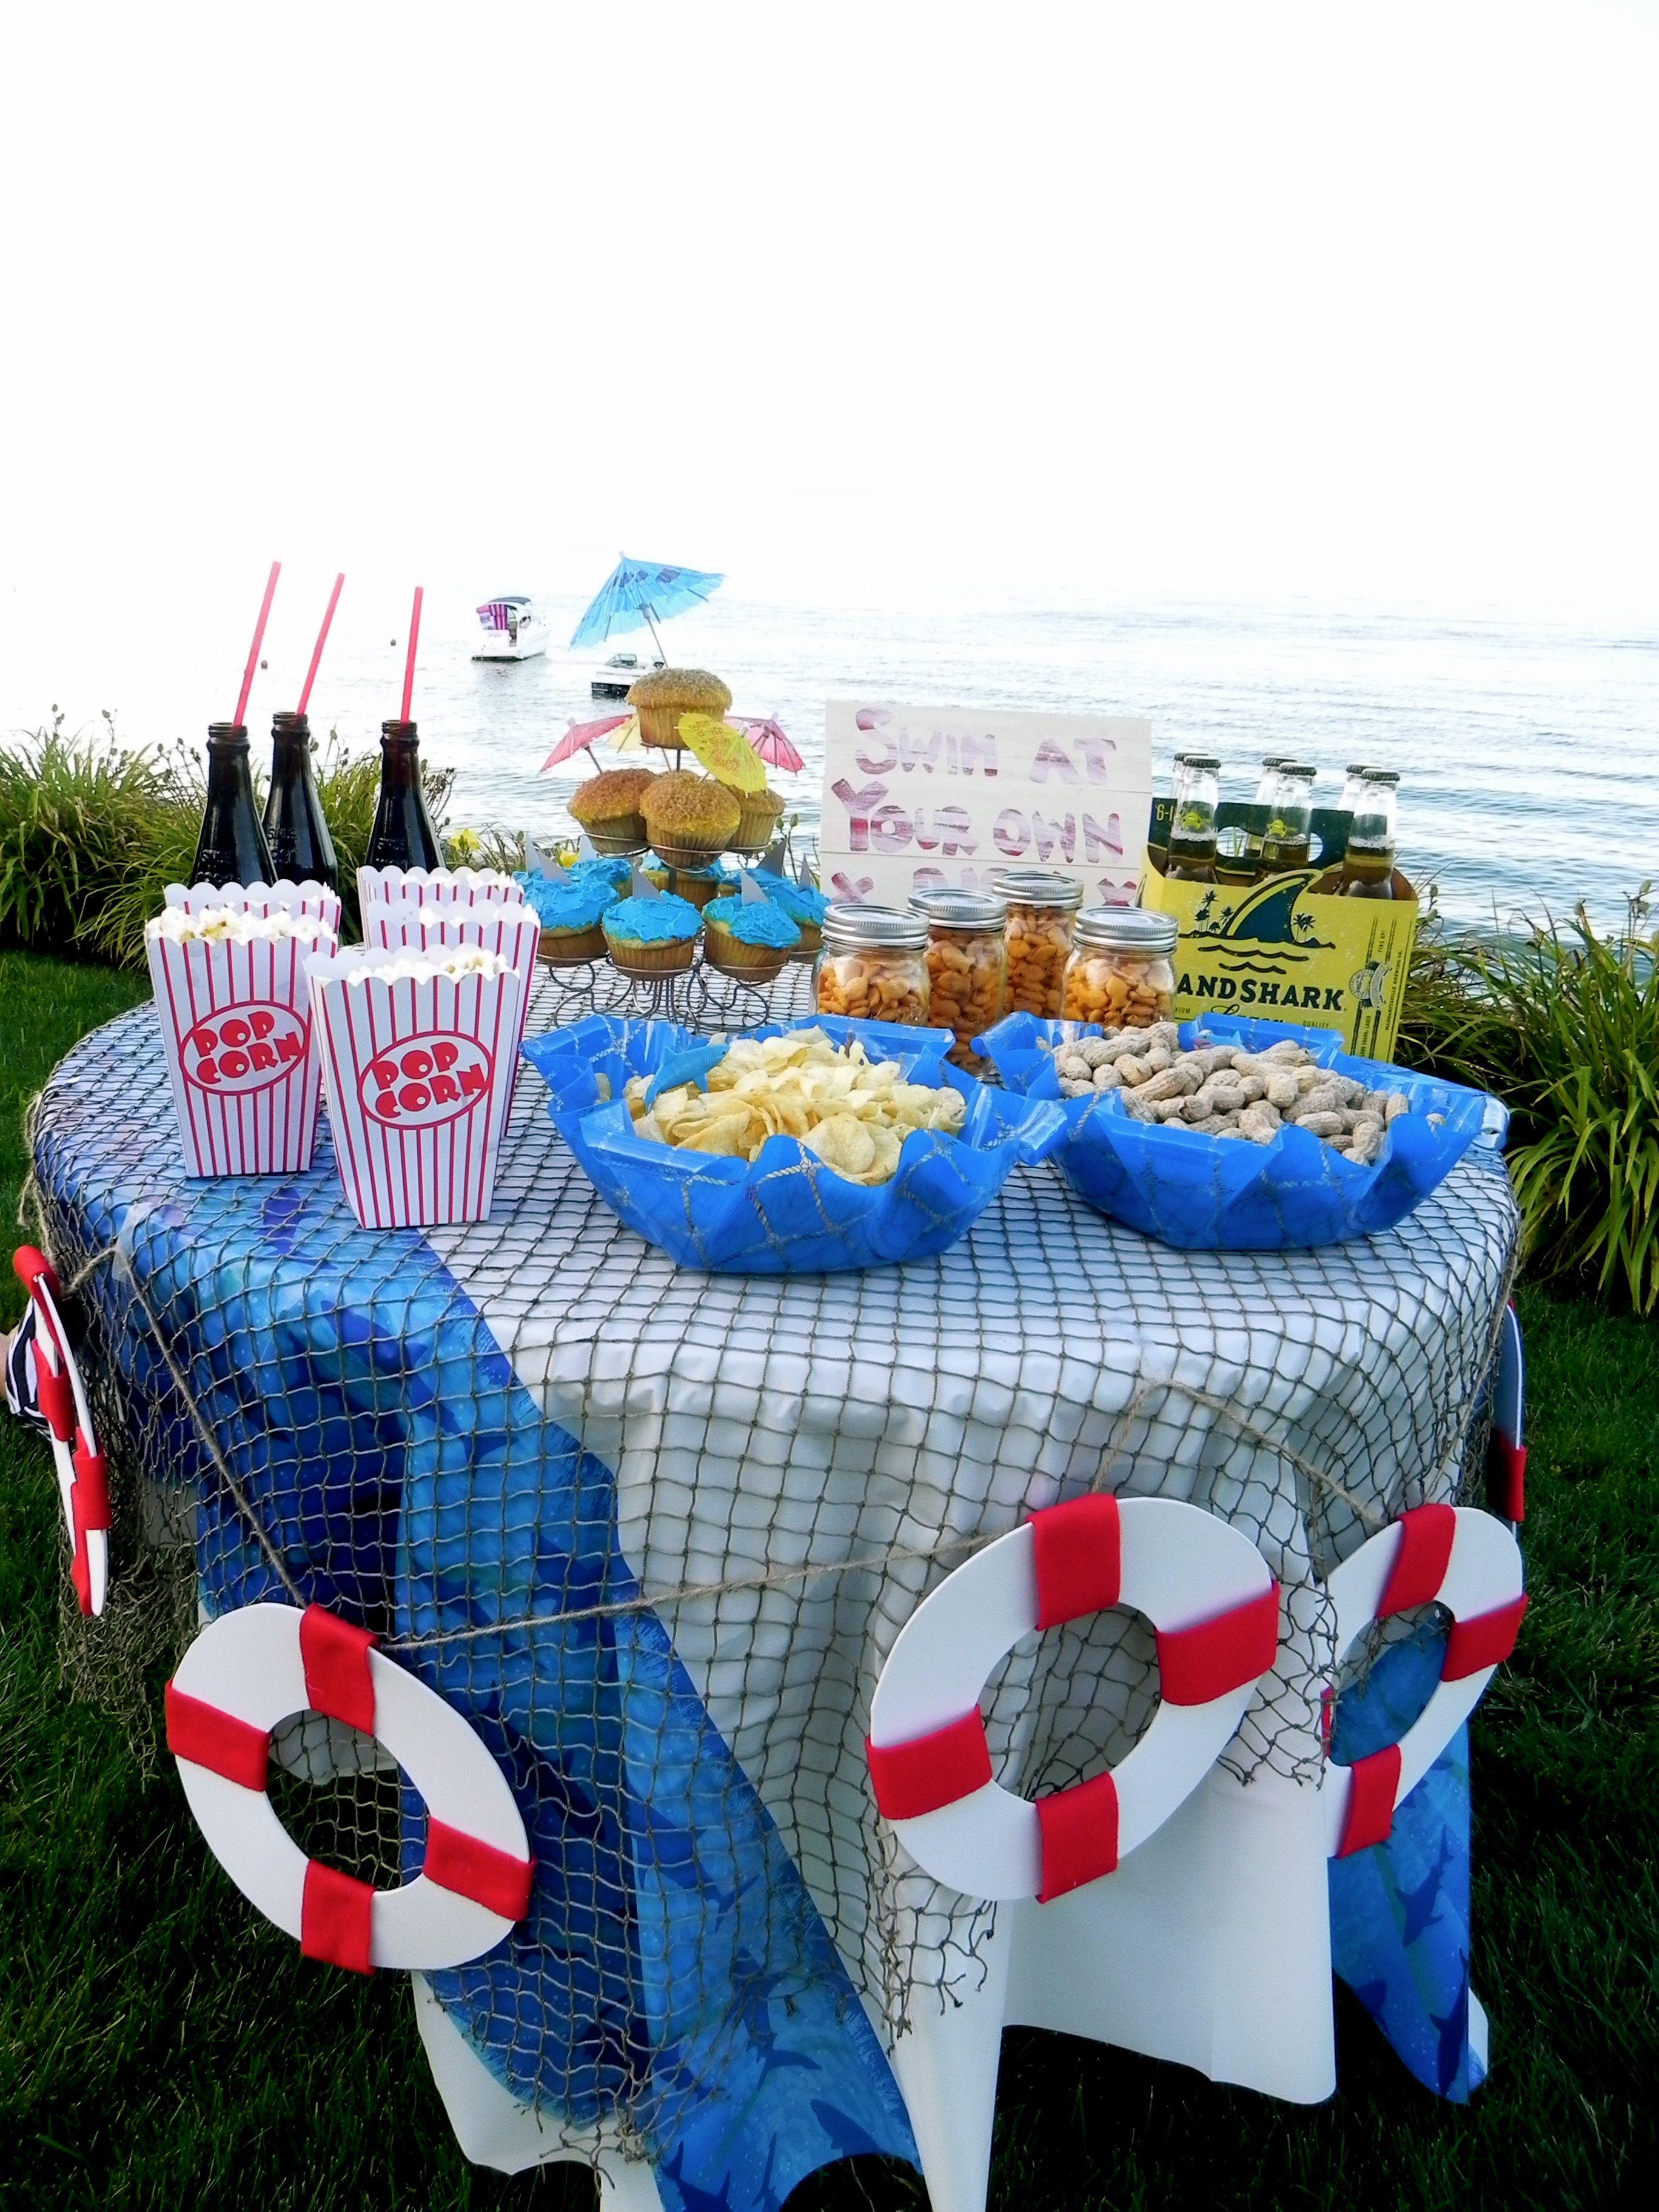 tropical party dinner utnaviinfo marvelous for decorations s decoration beach decorating themed ideas best decor theme parties sea